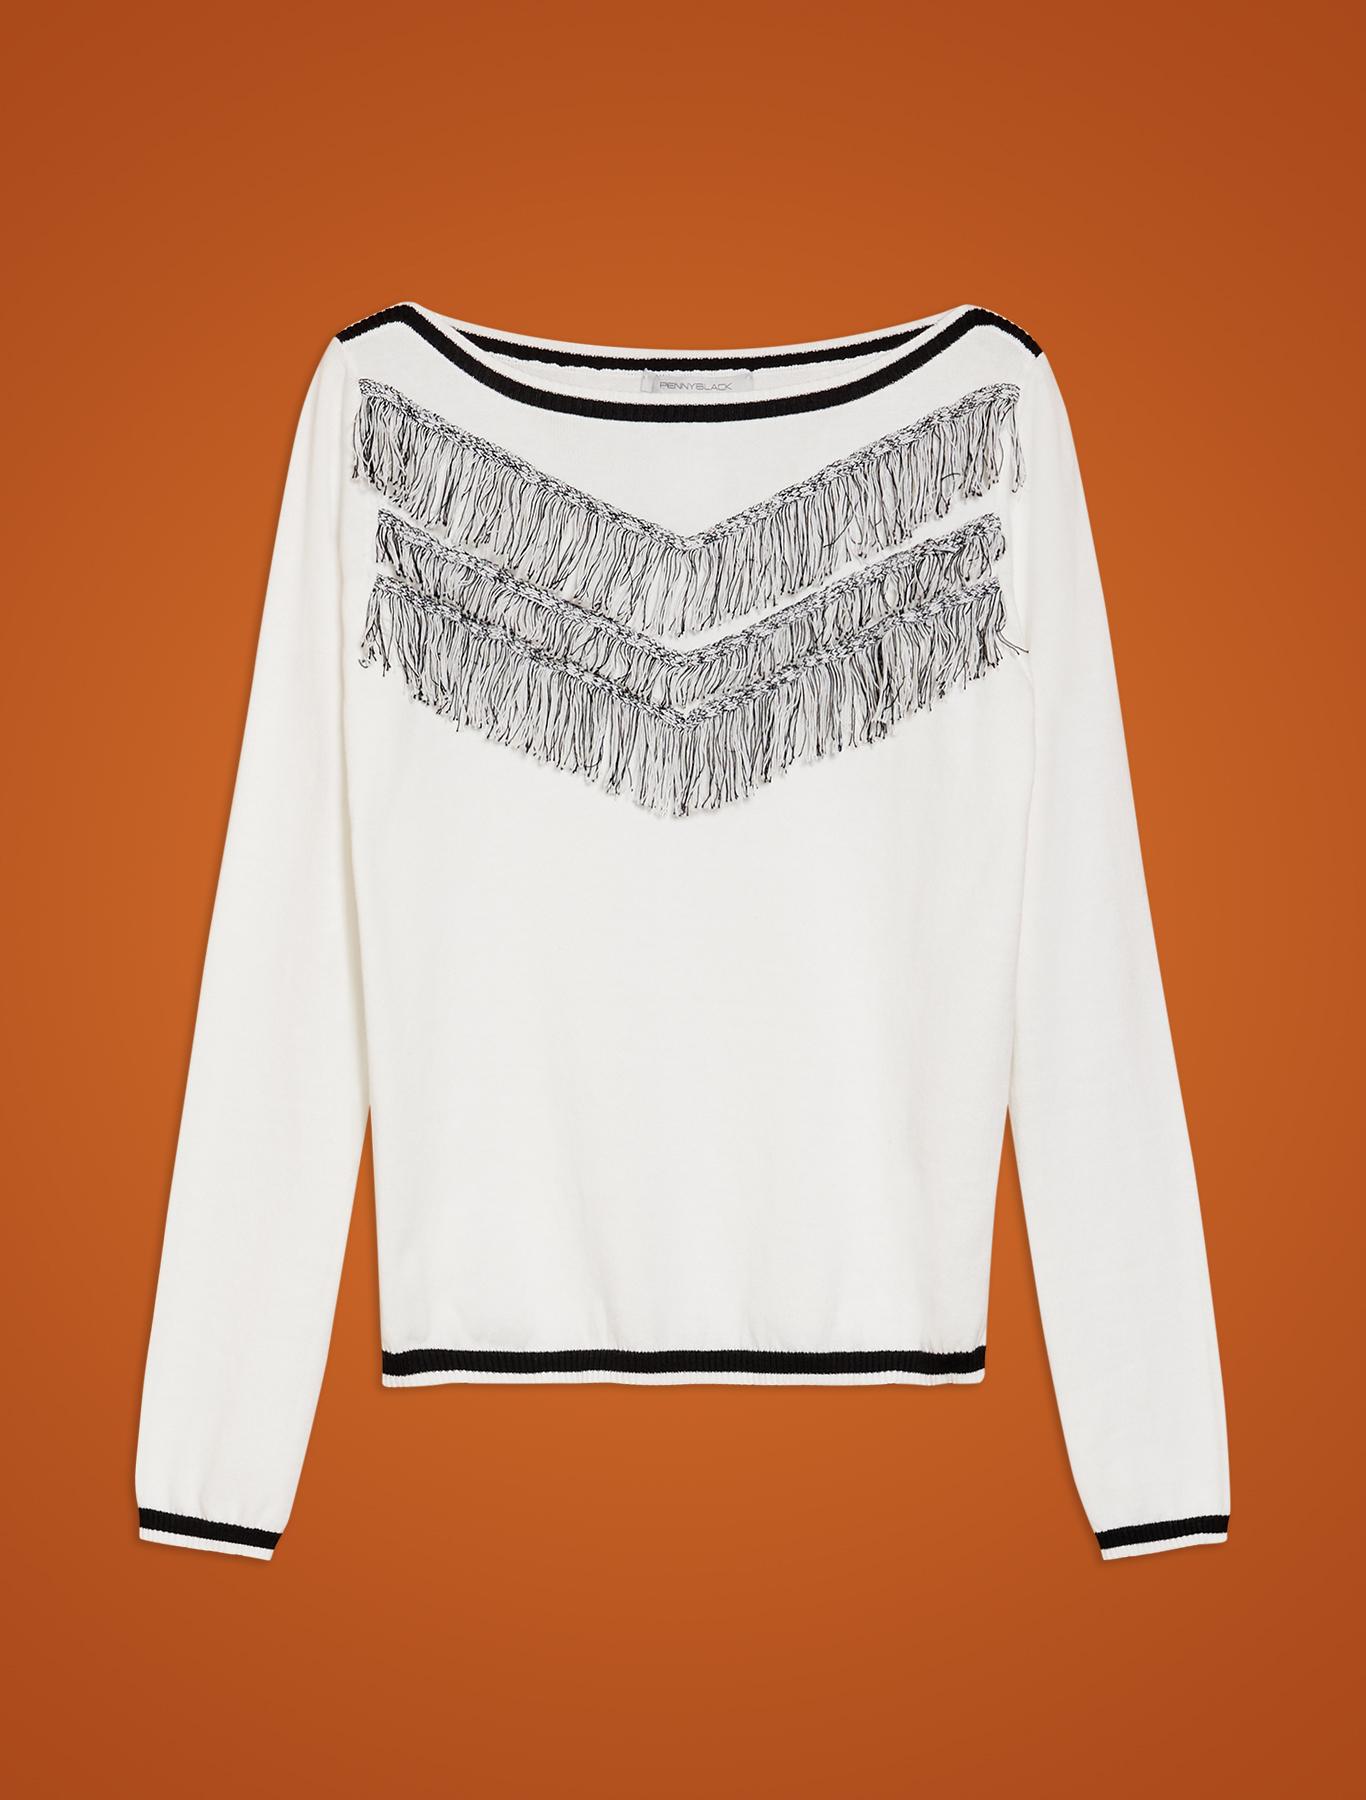 Cotton jumper with fringe - white - pennyblack